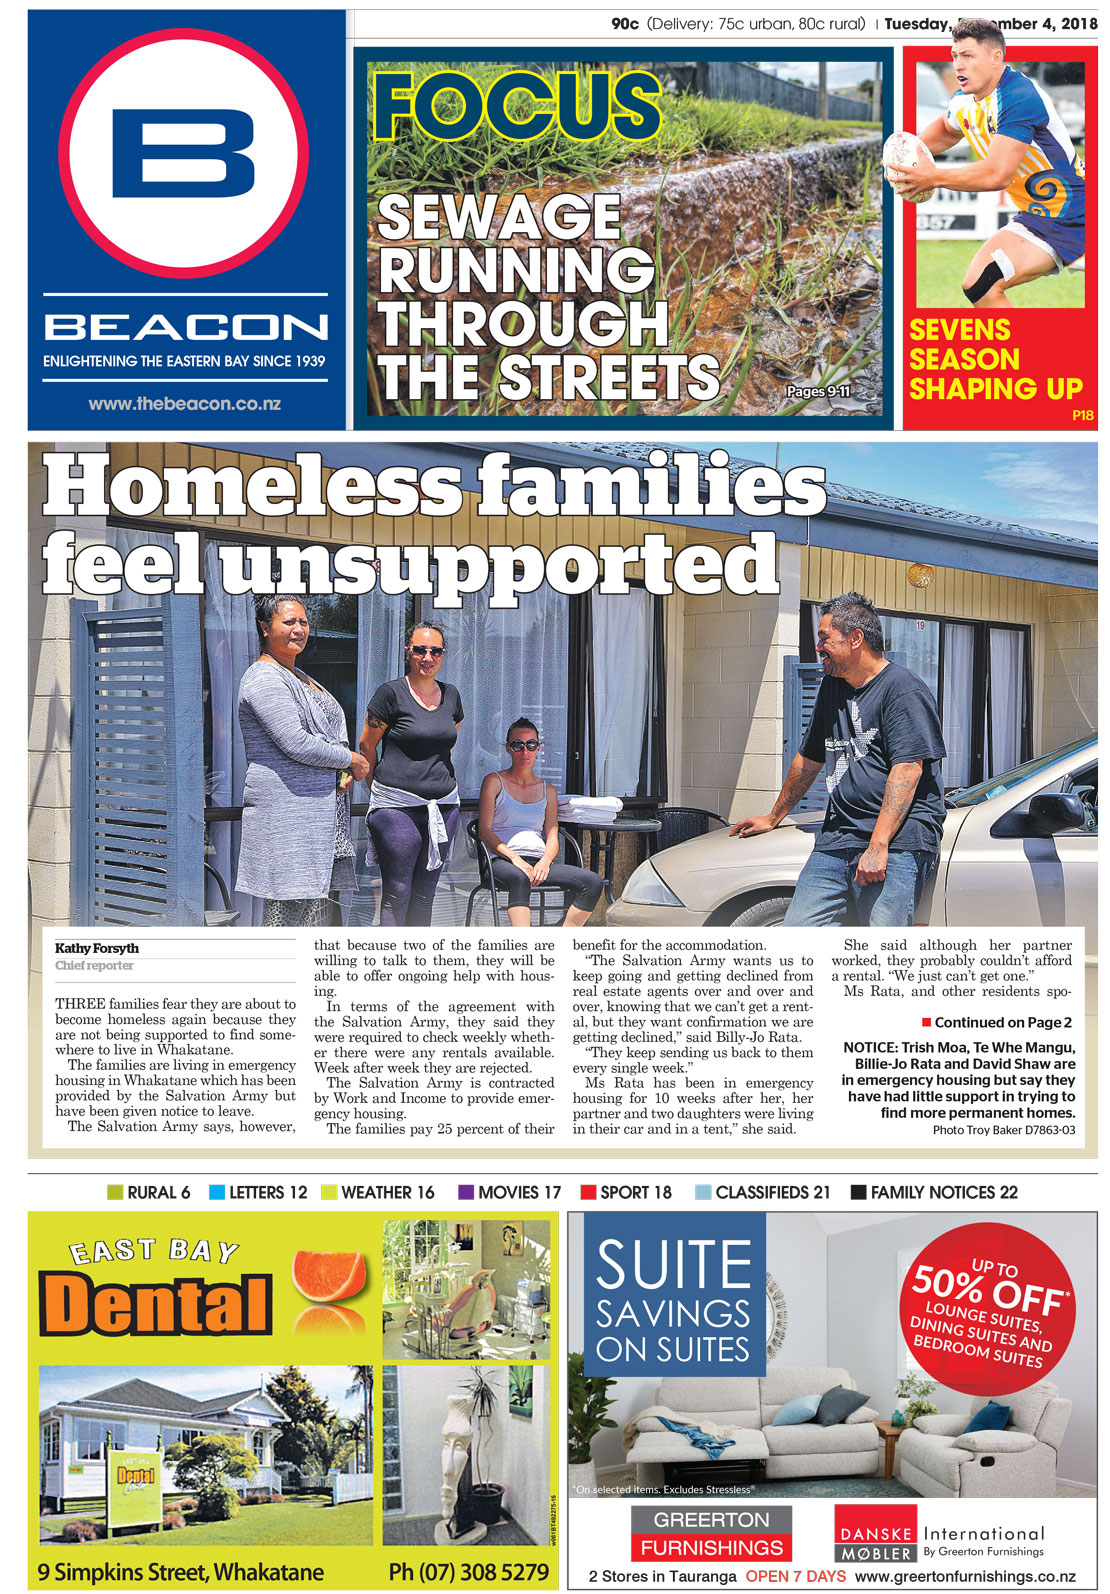 55_Community-NOTY_The-Beacon_Story-4.jpg